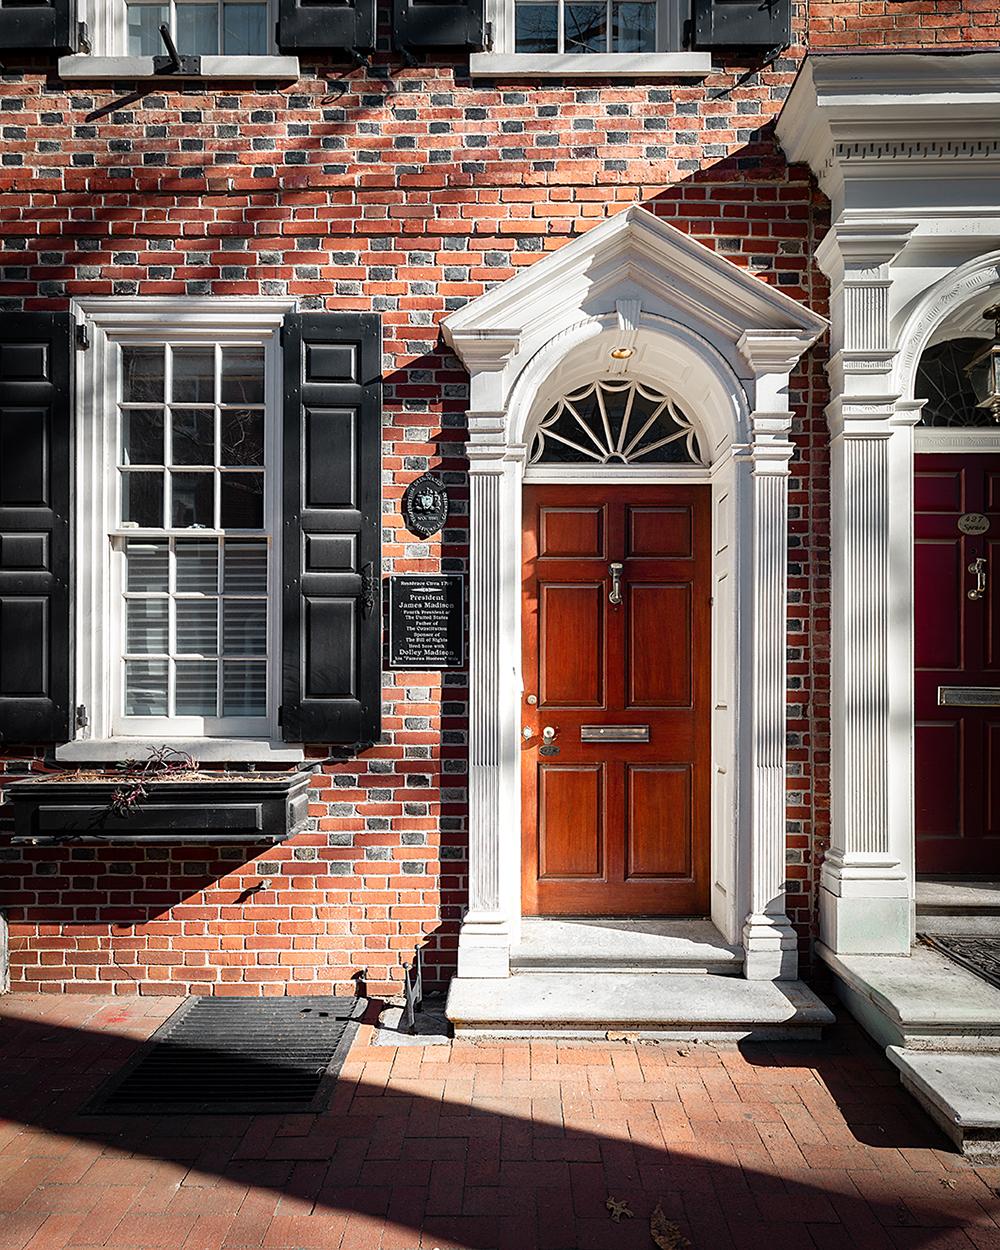 James Madison's House